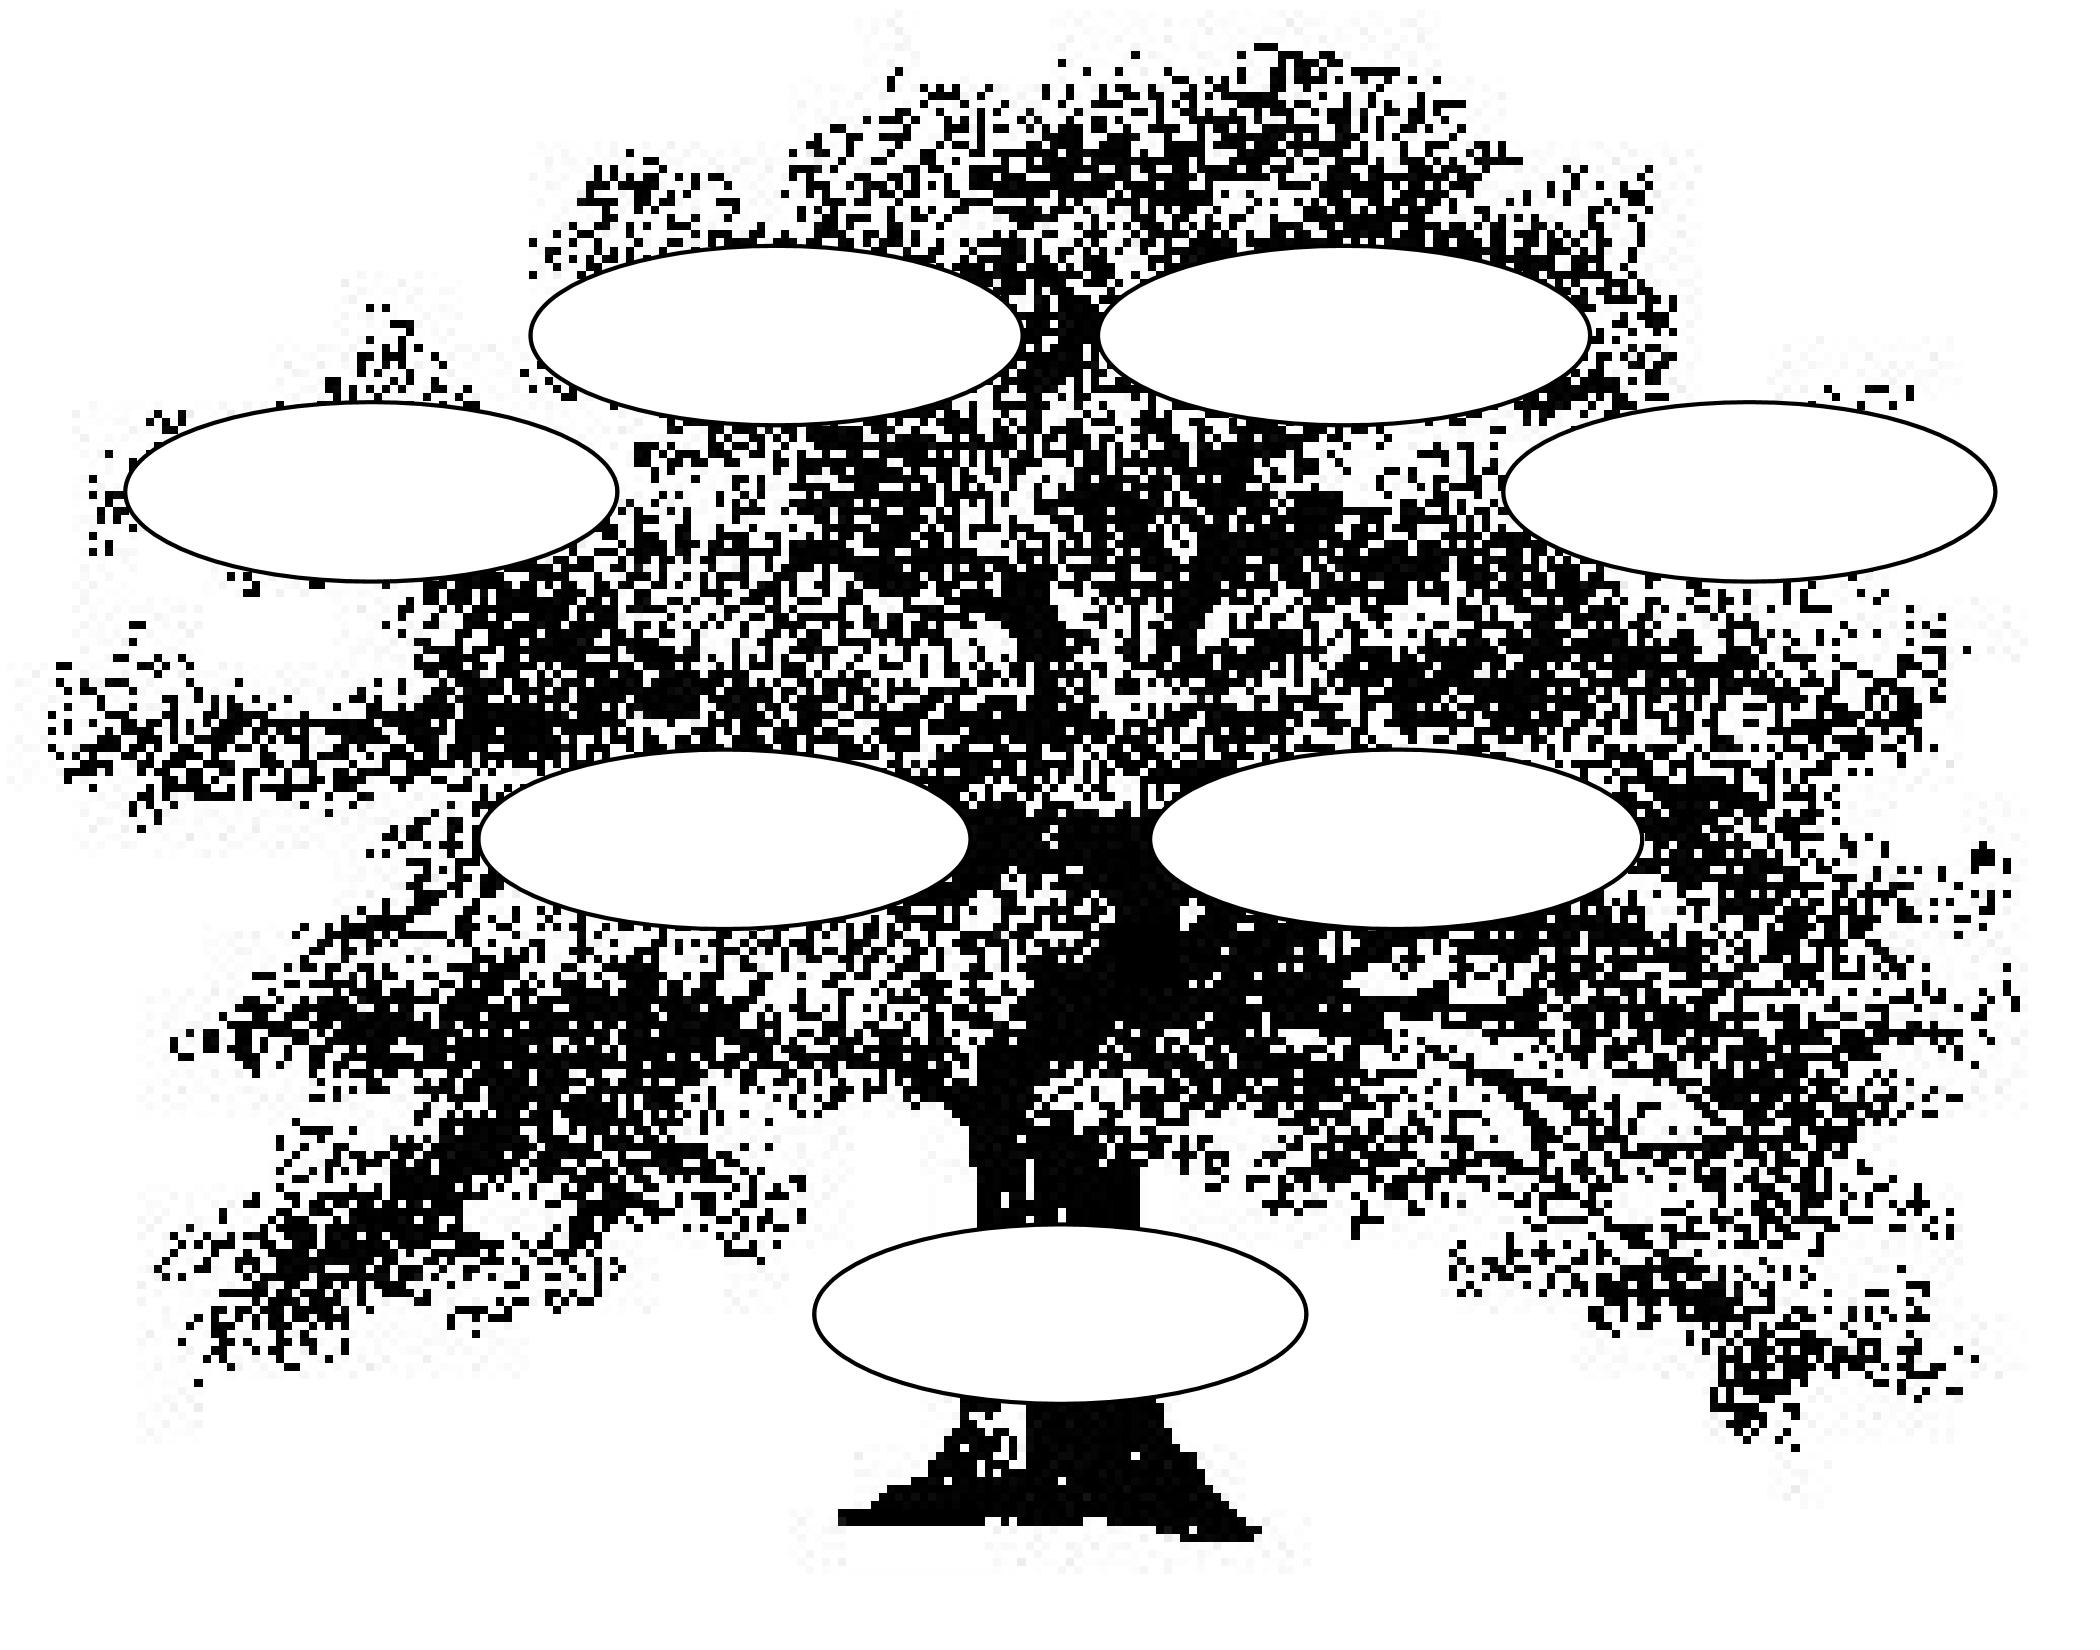 Free clipart image family tree.